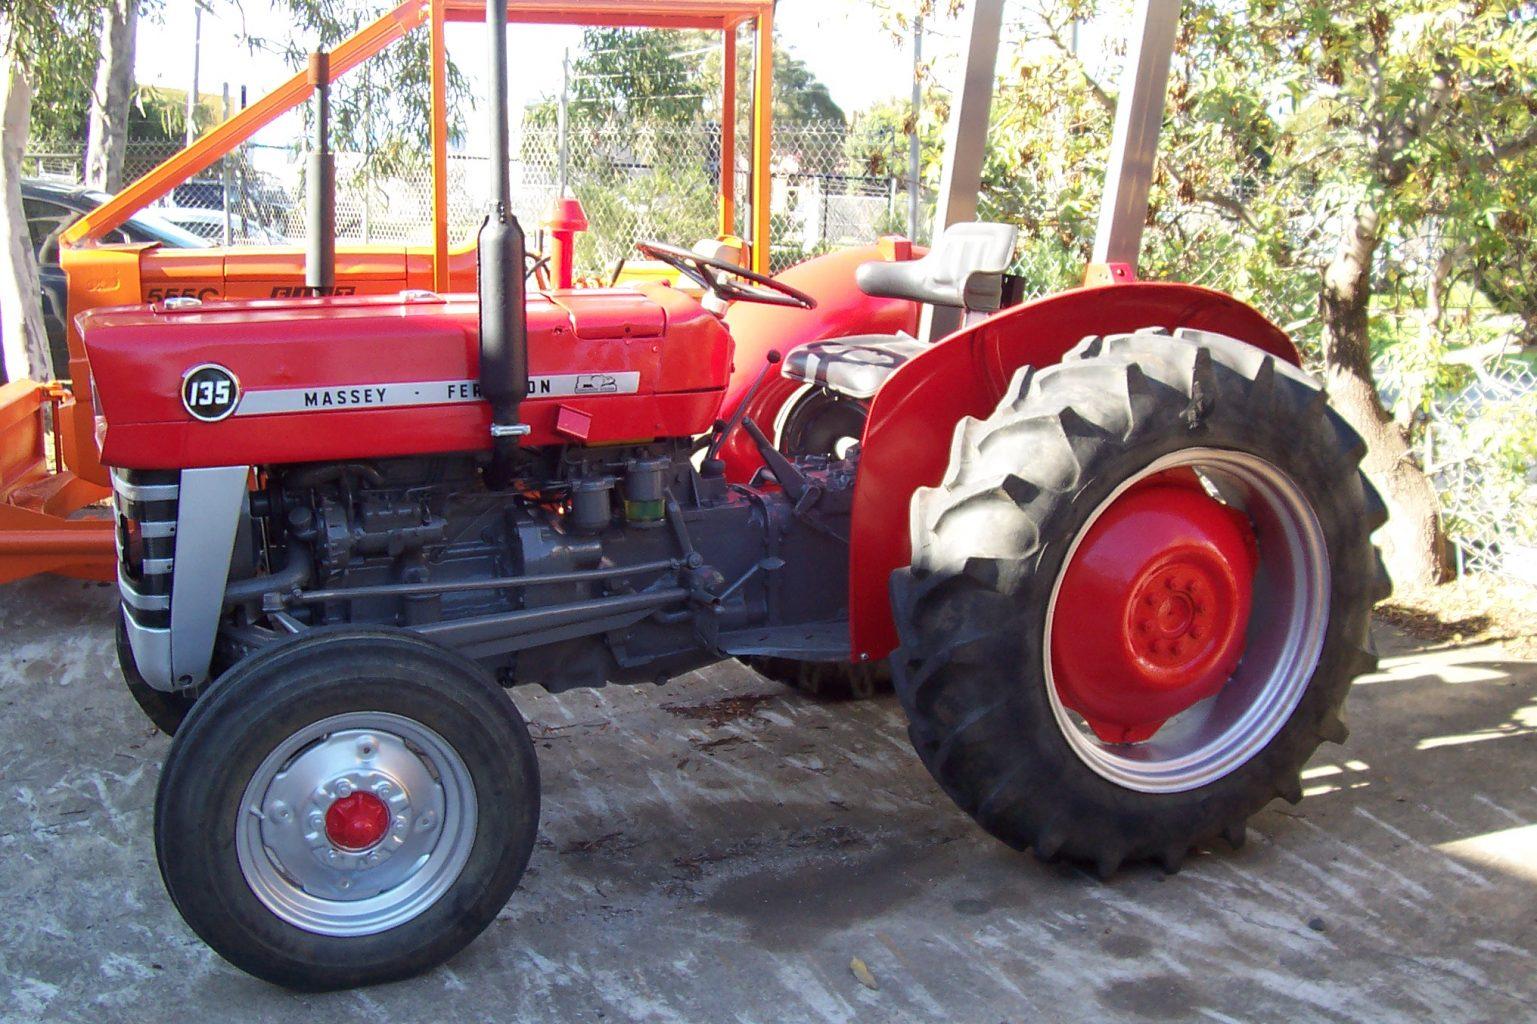 hight resolution of  massey ferguson 135 original 2017 massey ferguson 135 tractor price models specs 1976 ford tractor 8700 voltage regulator wiring diagram